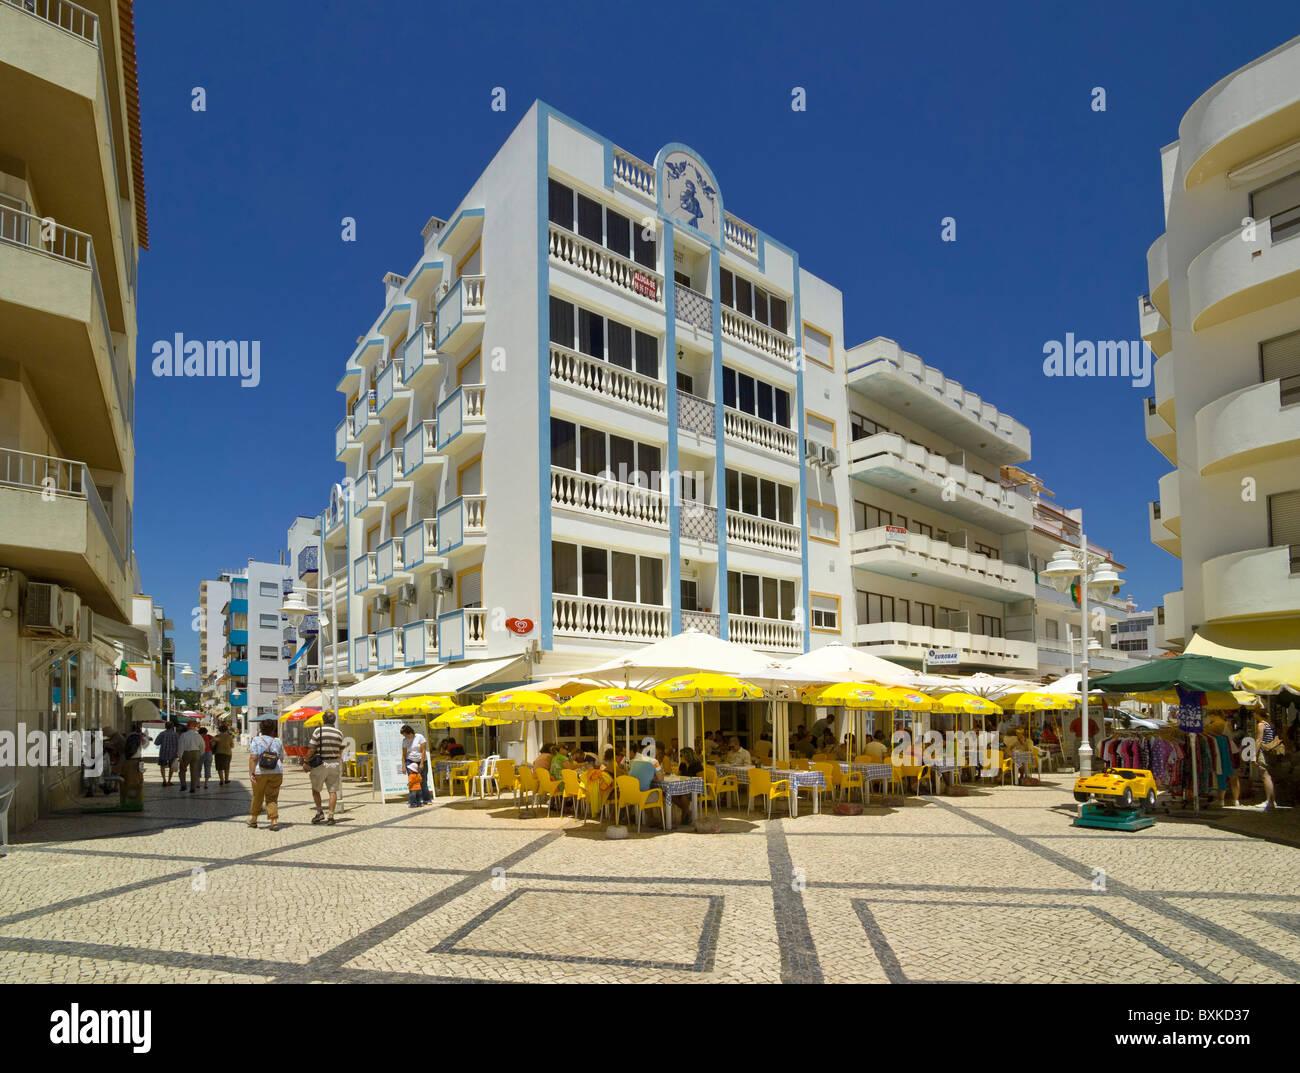 Montegordo; Outdoor Restaurant In The Town Centre, the Algarve, Portugal - Stock Image